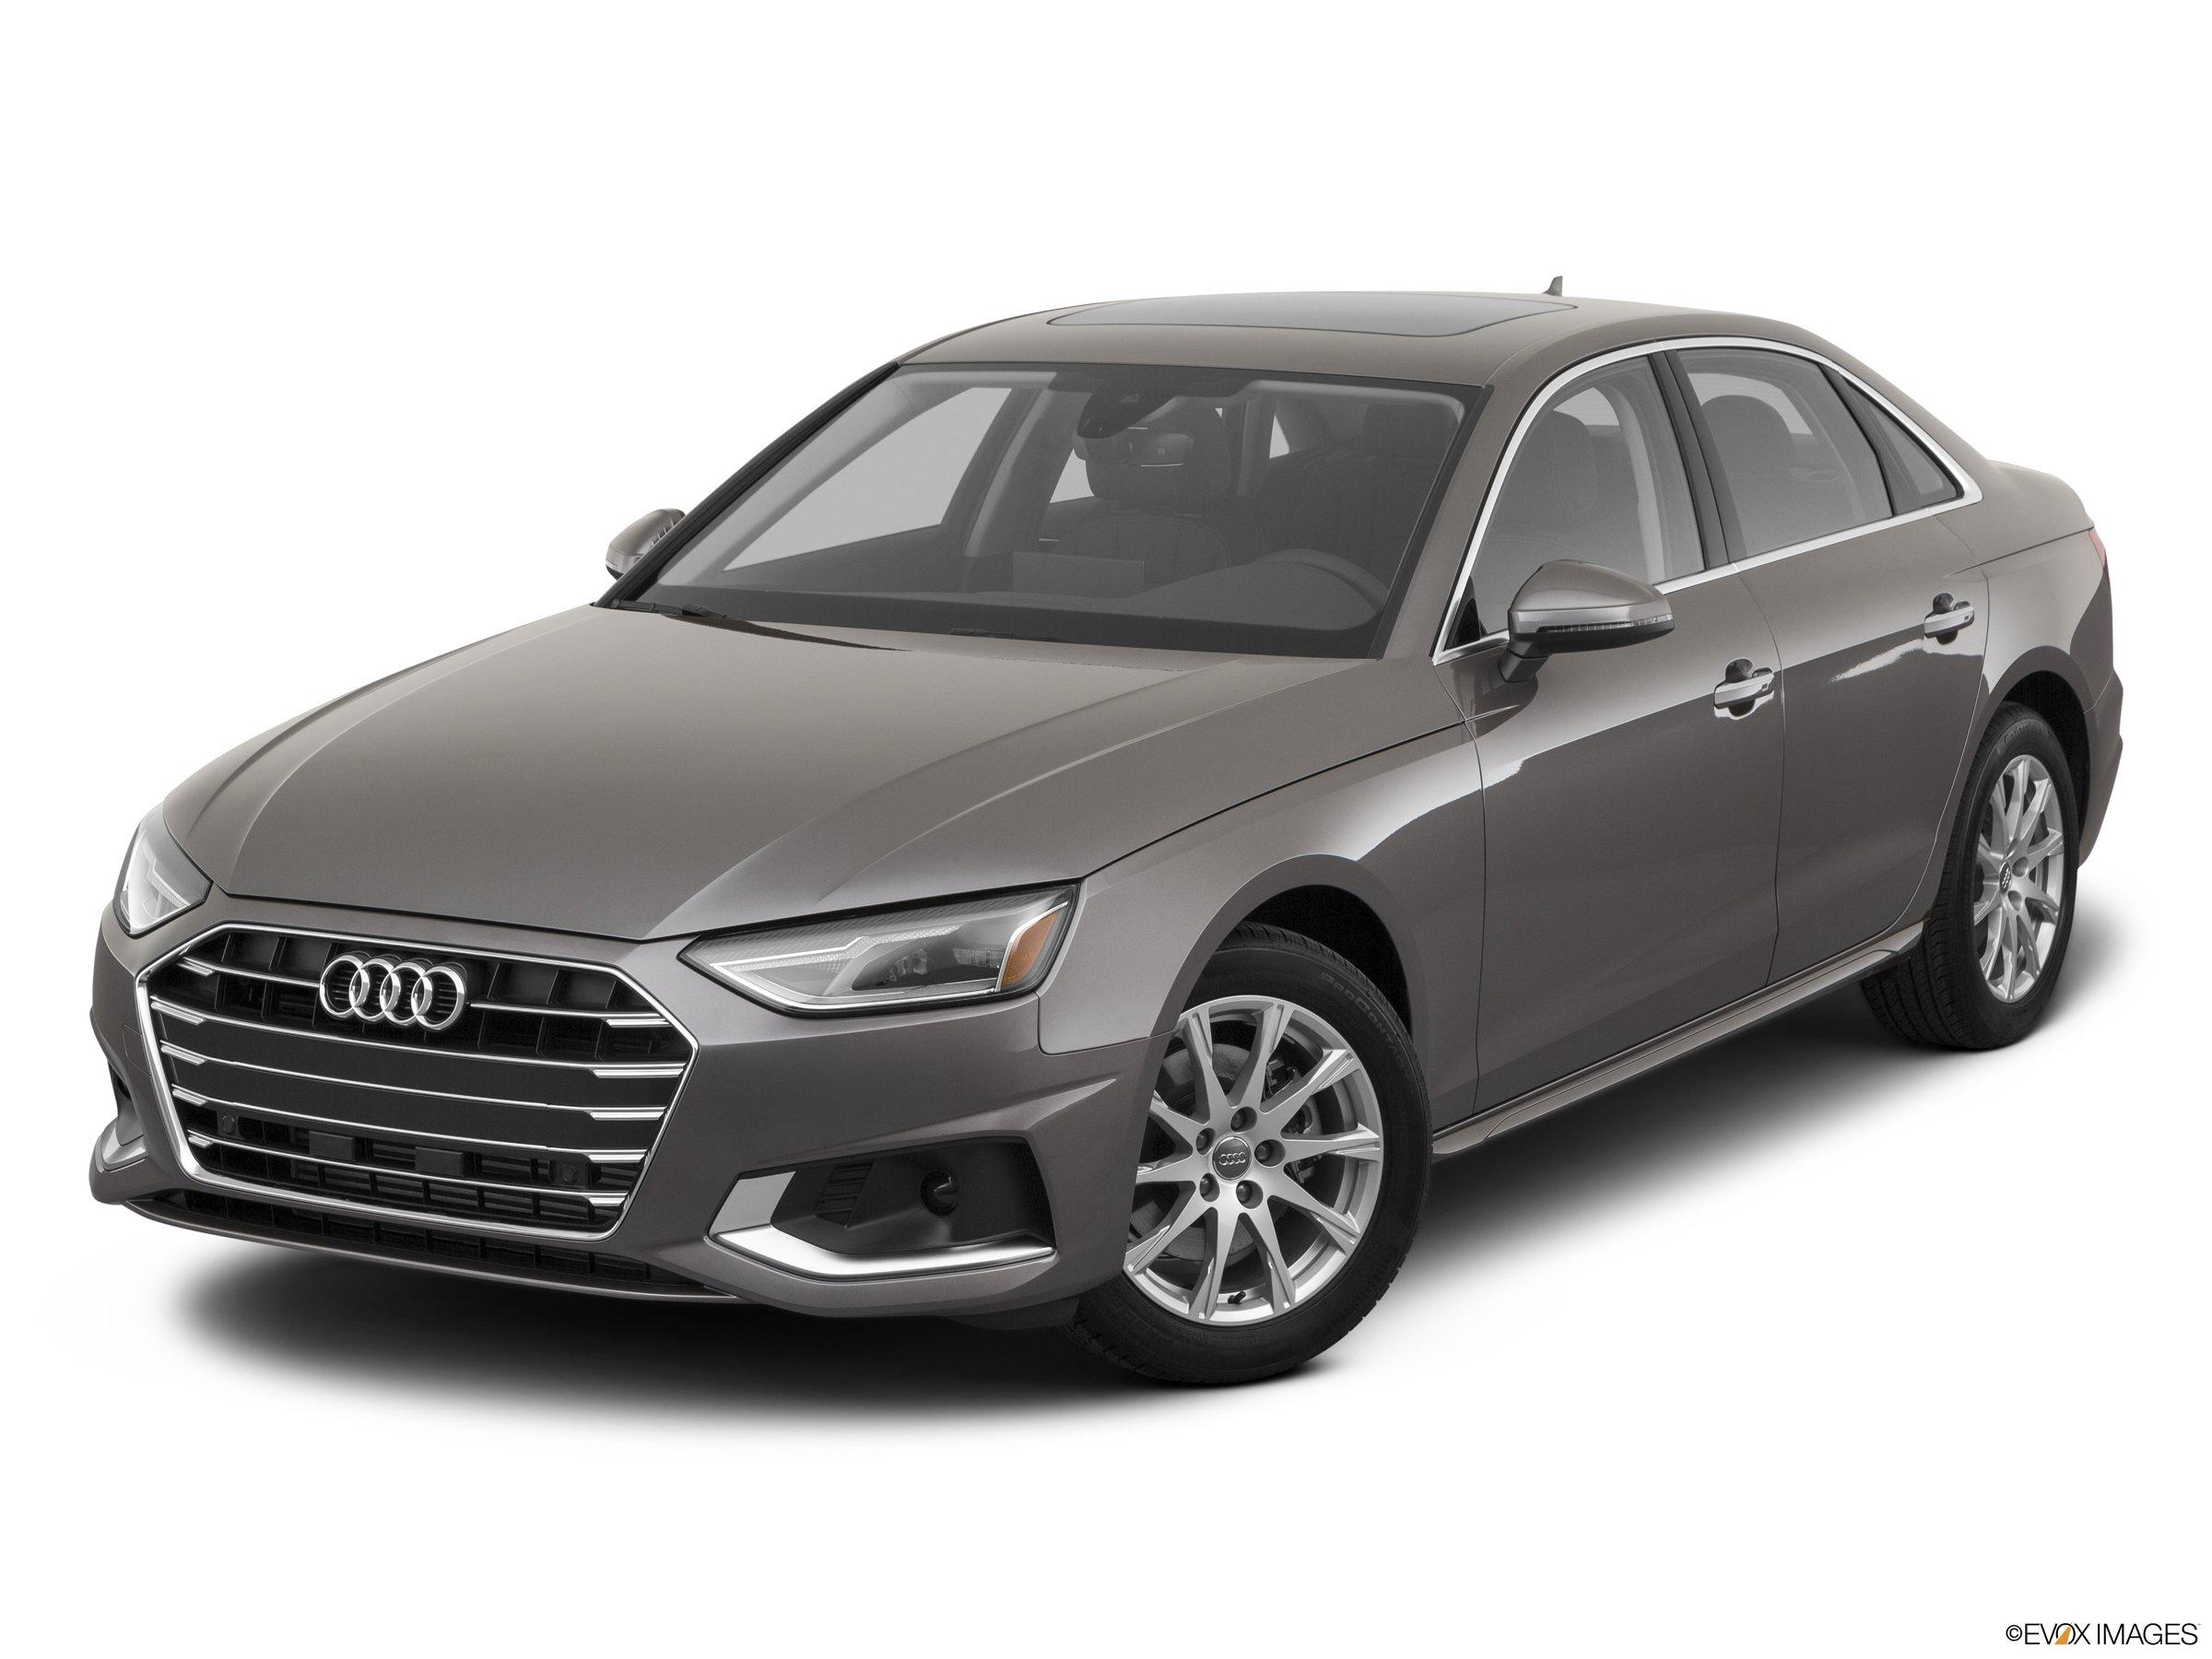 2020 Audi A4 Premium 40 TFSI FWD sedan